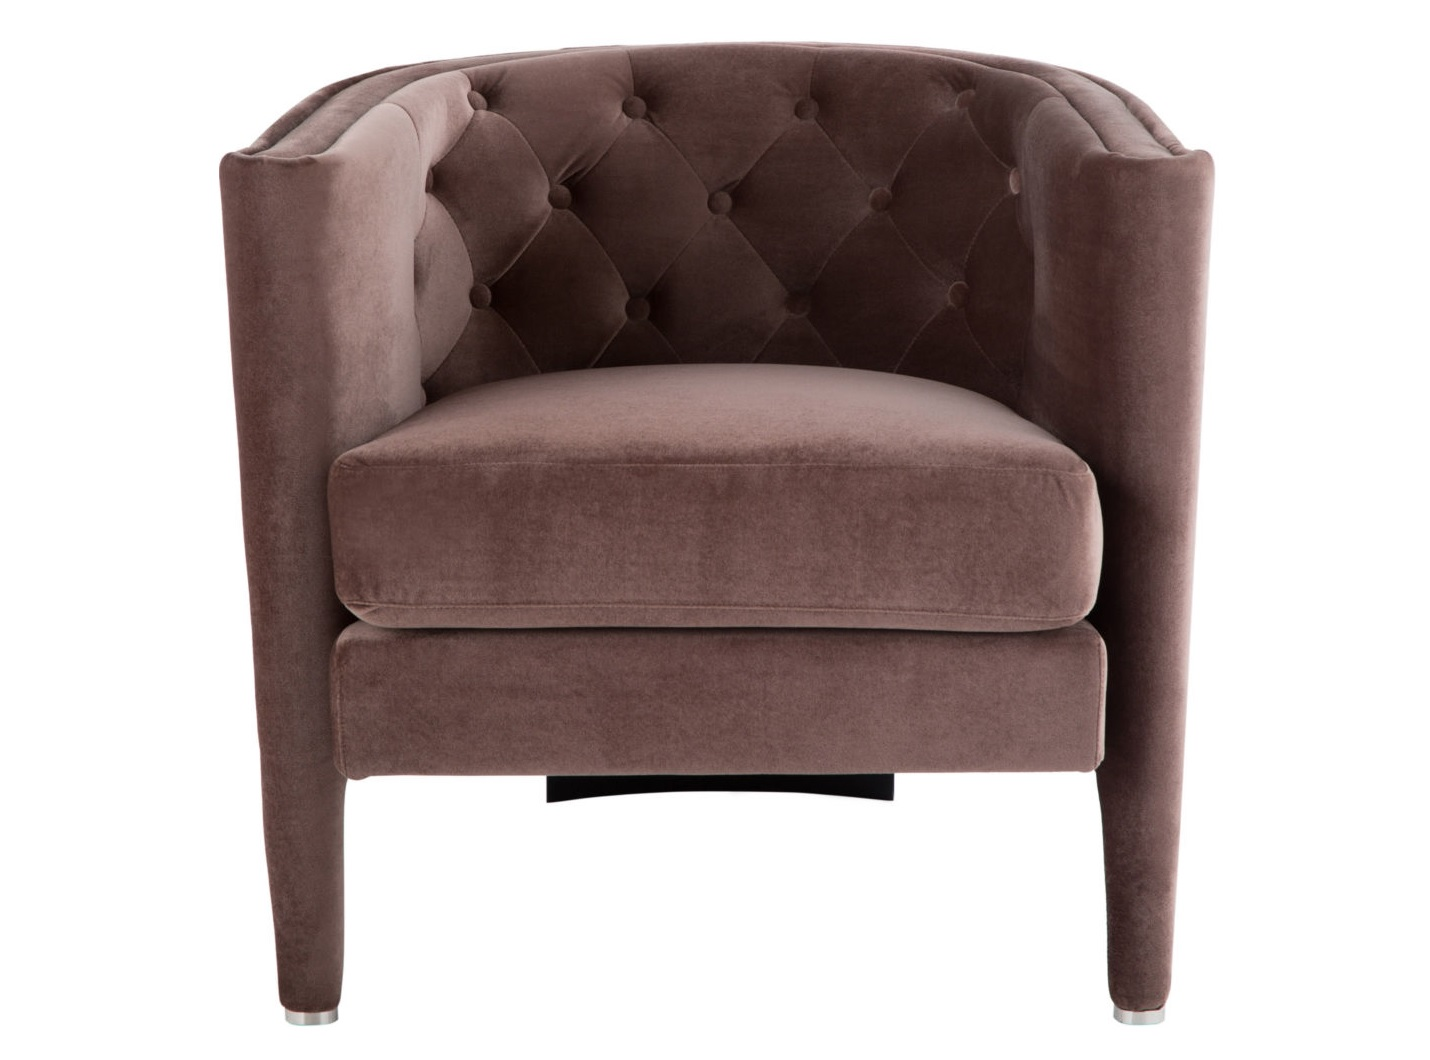 Кресло RayИнтерьерные кресла<br><br><br>Material: Текстиль